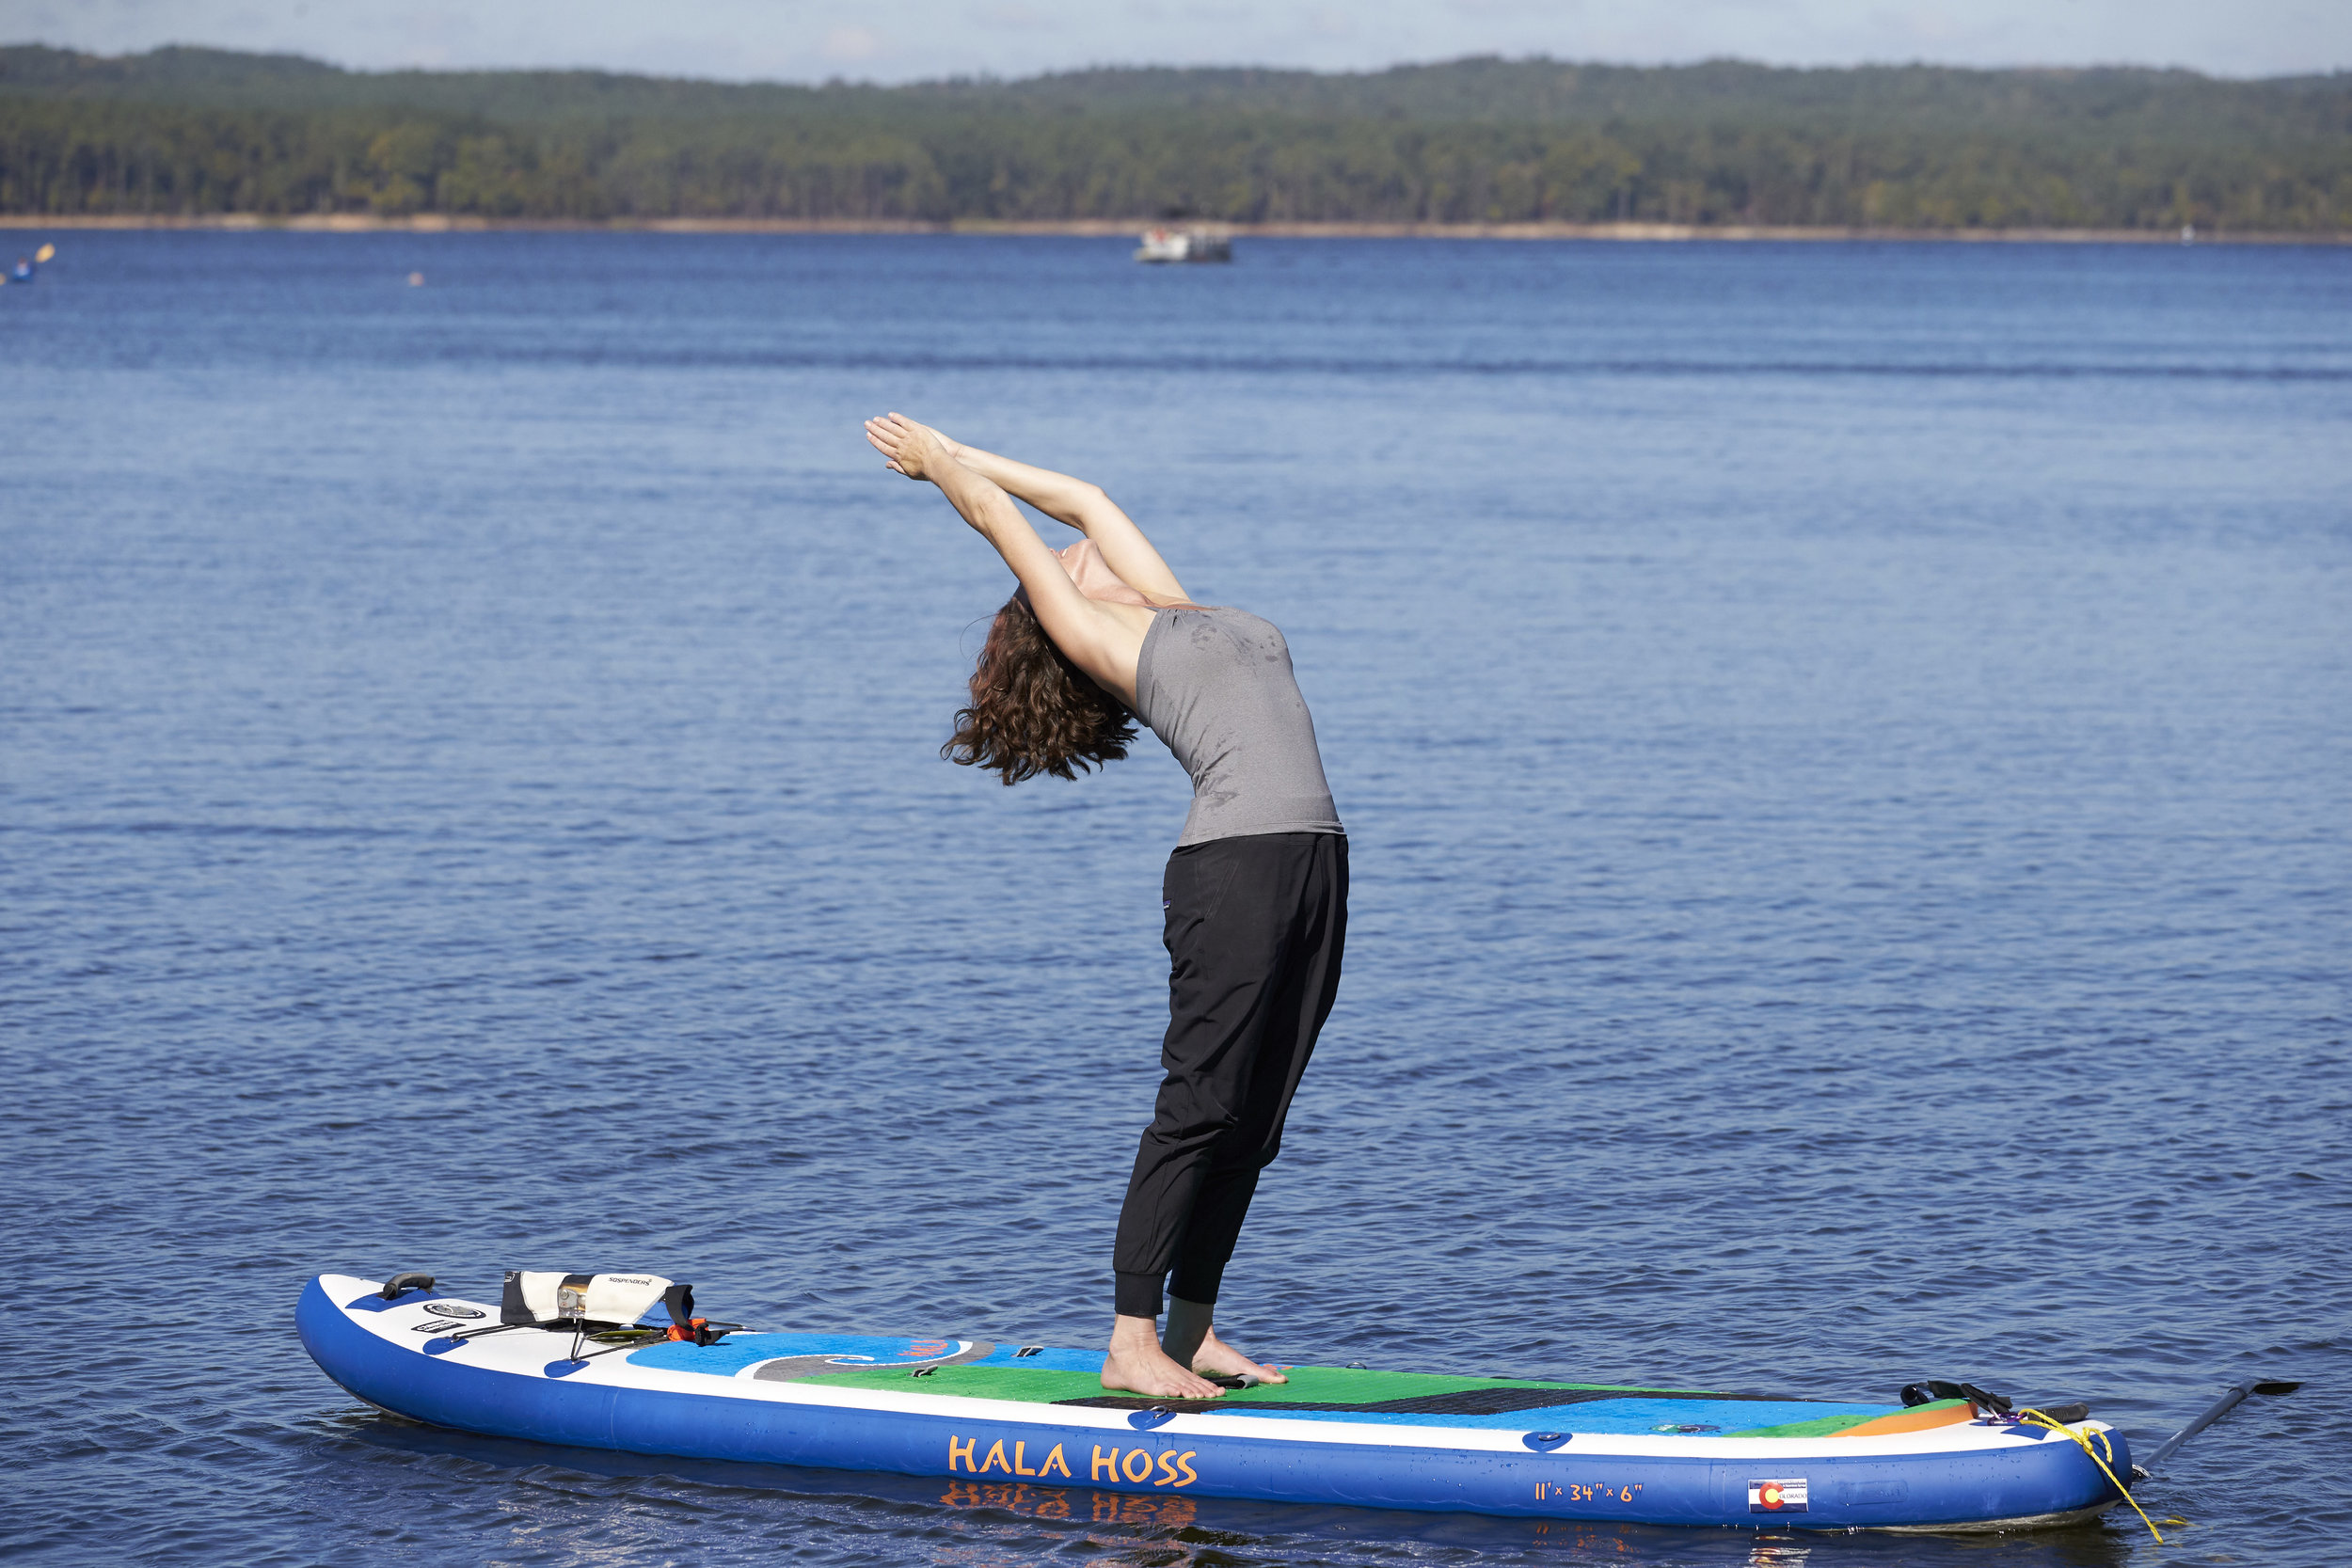 WALK7801 Ebenezer 2017-10-03 10.34.04 Allison Allison Paddleboard Yoga.jpg